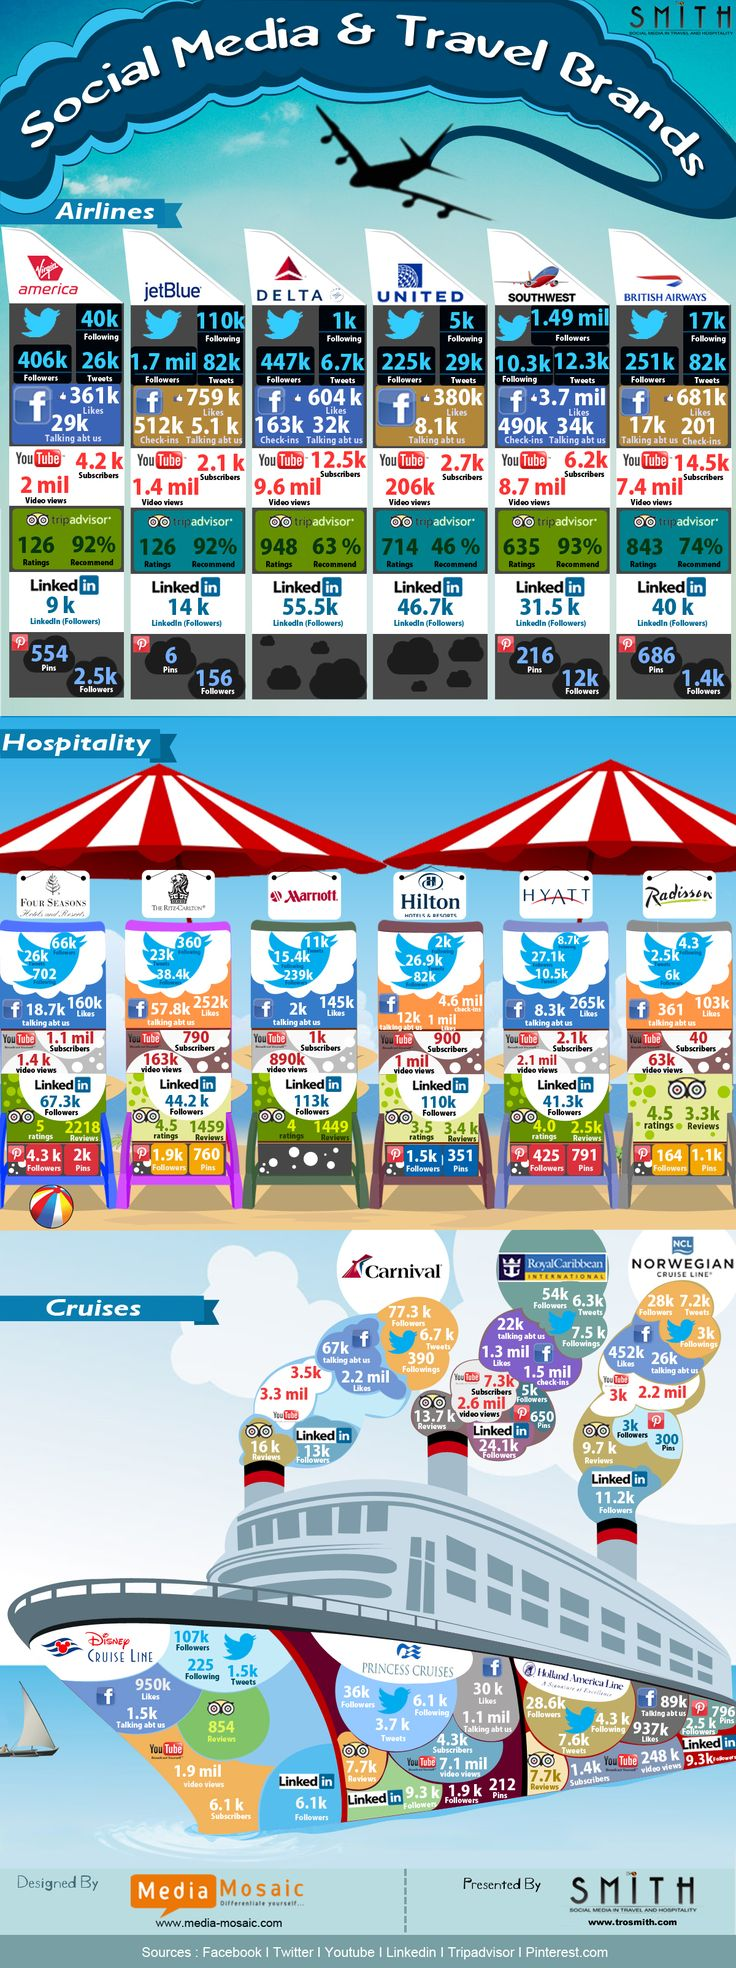 Social media && Travel brands #infographic